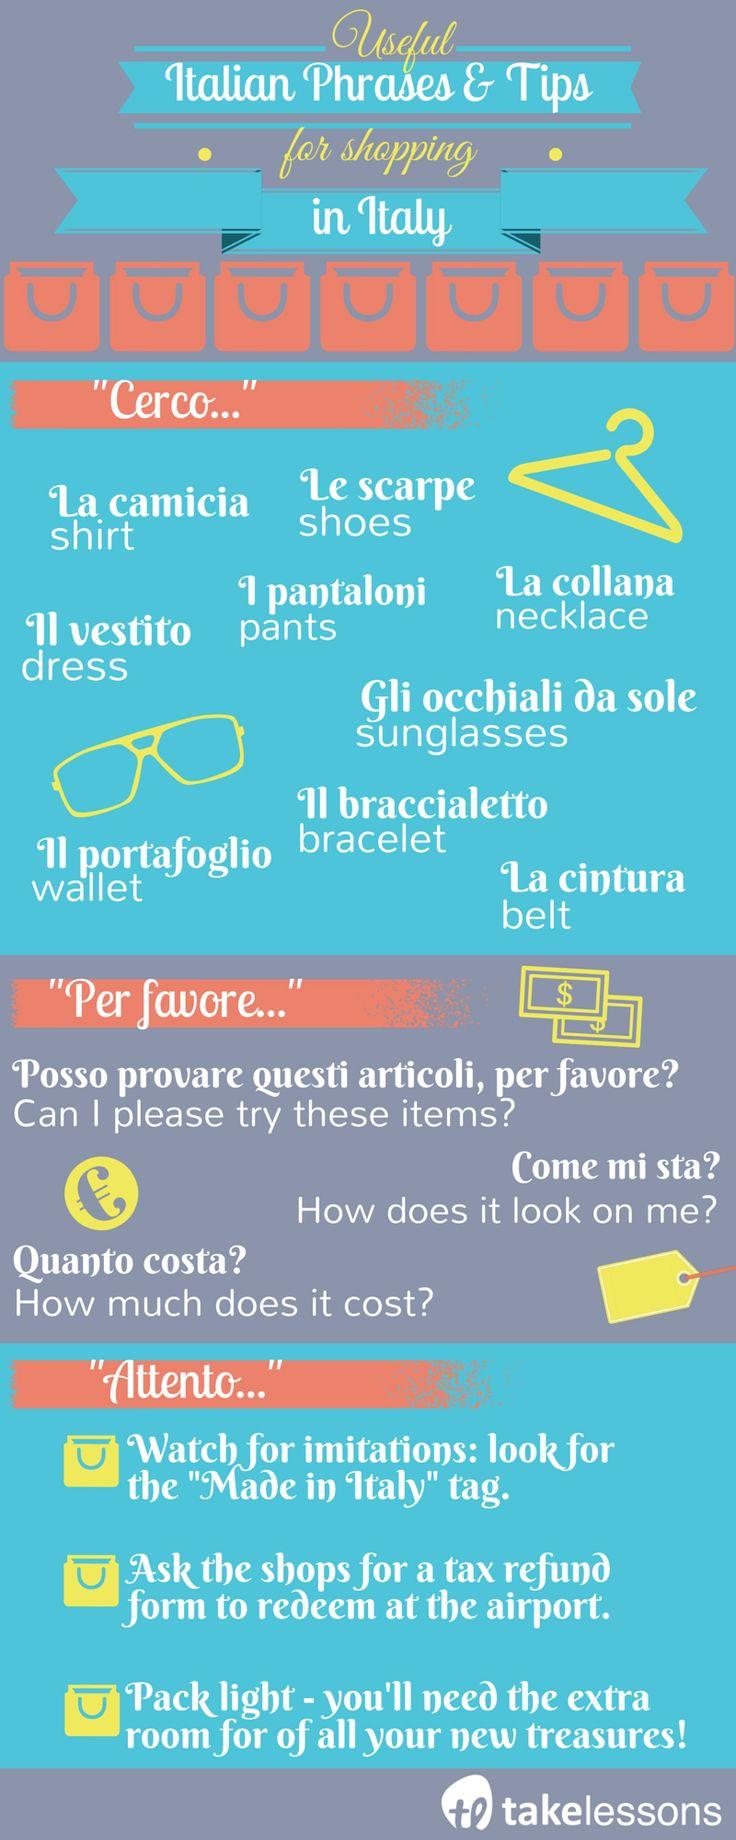 Useful Italian Phrases and Tips for Shopping in Italy http://takelessons.com/blog/useful-italian-phrases-shopping-z09?utm_source=social&utm_medium=blog&utm_campaign=Pinterest